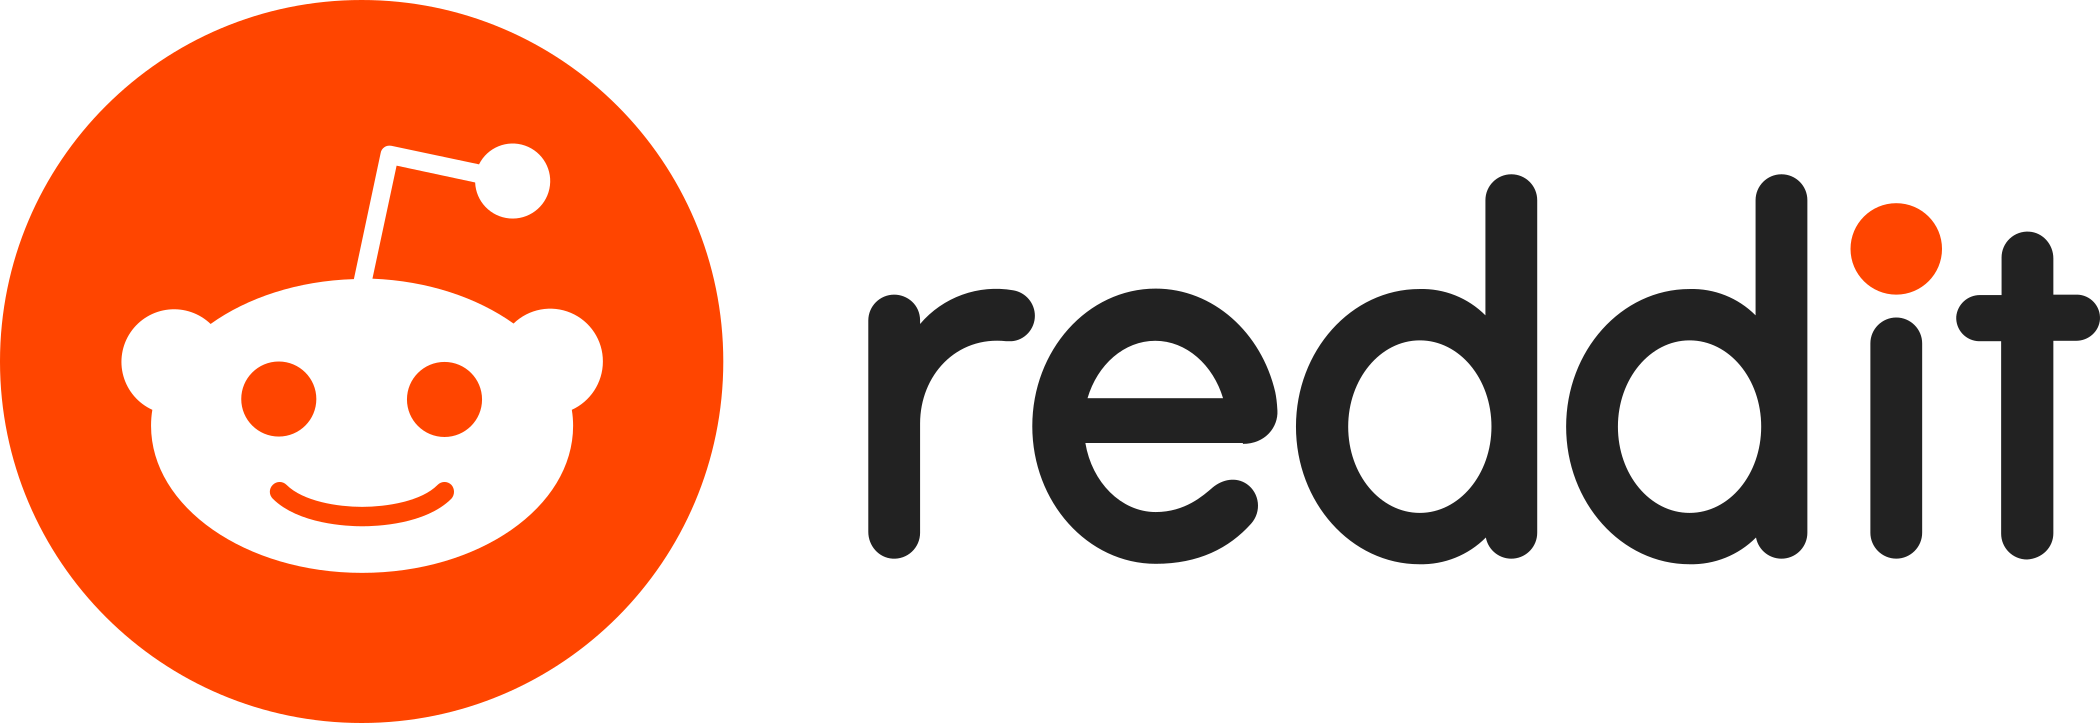 reddit logo 2 - Reddit Logo